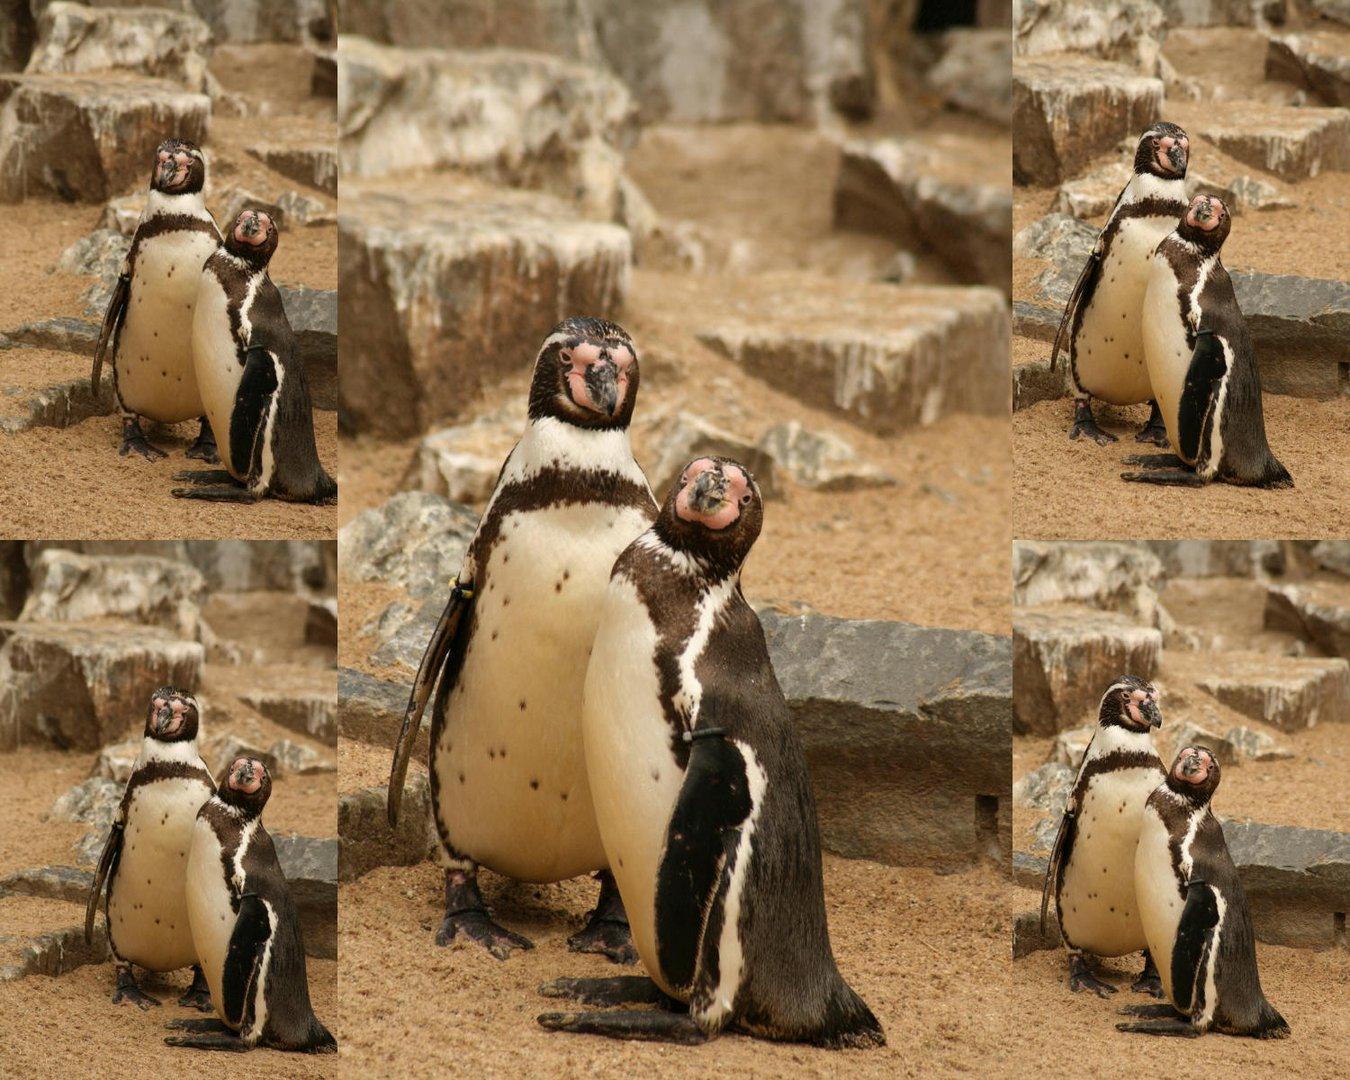 Pinguinpärchen im Kölner Zoo